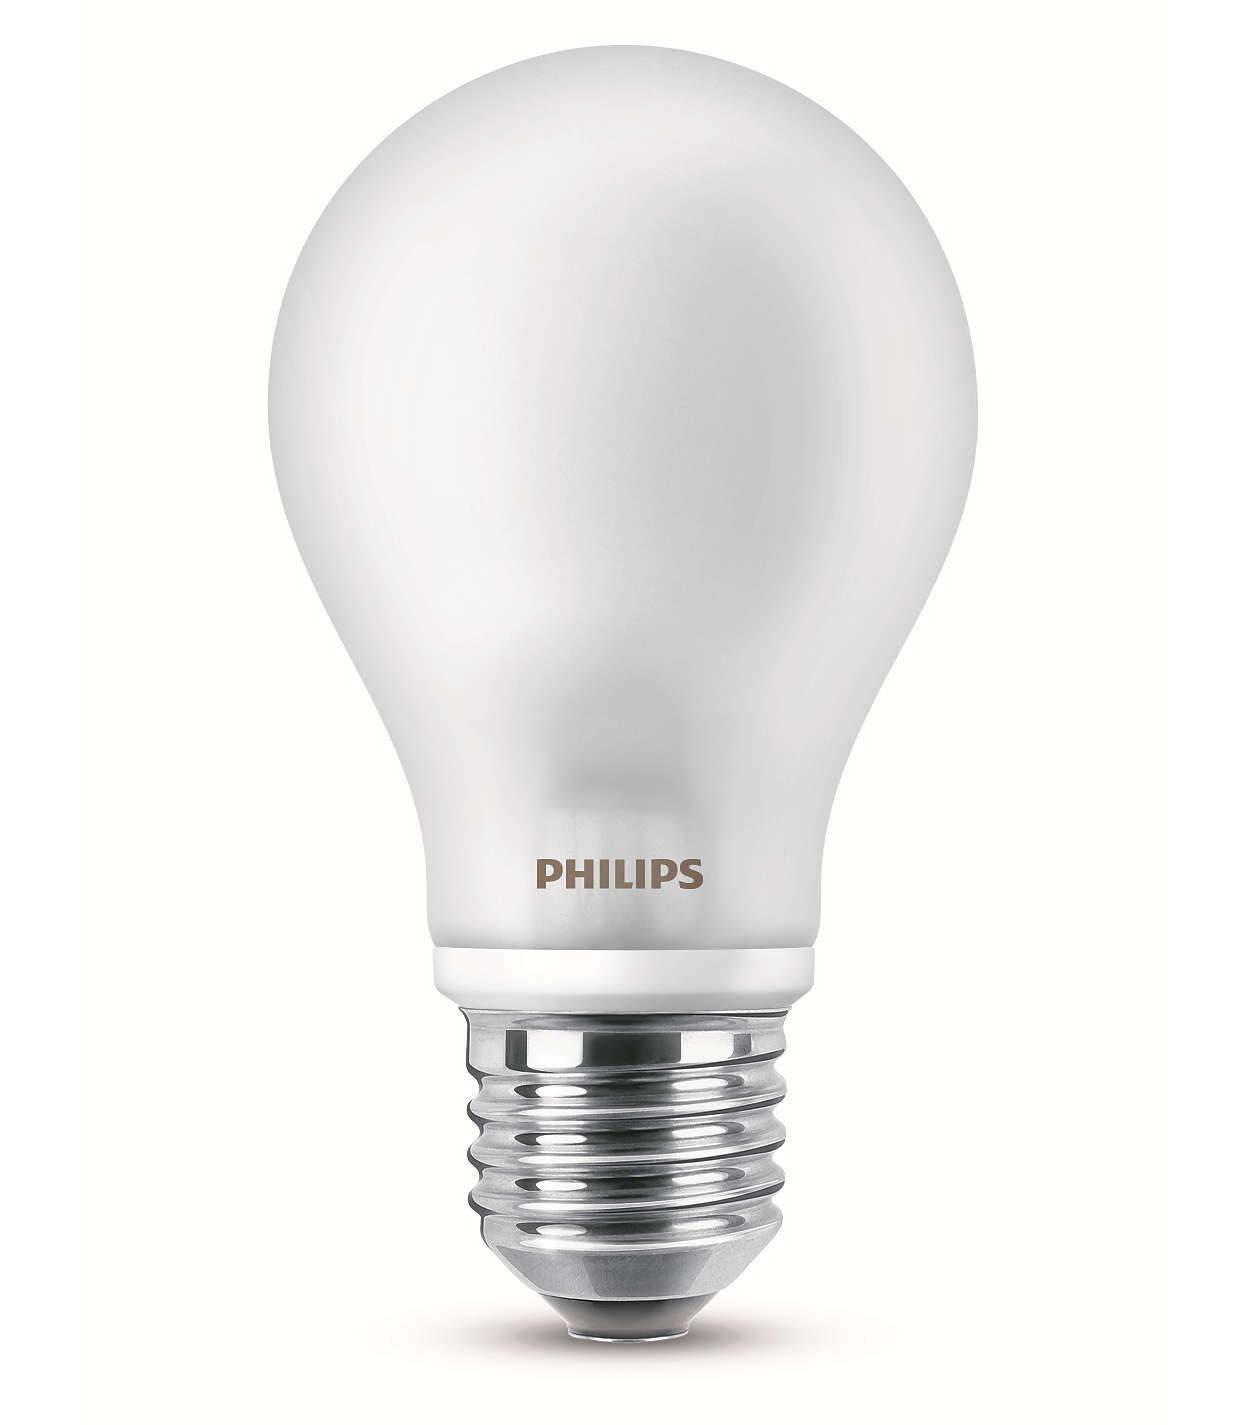 Det er LED, det er klassisk